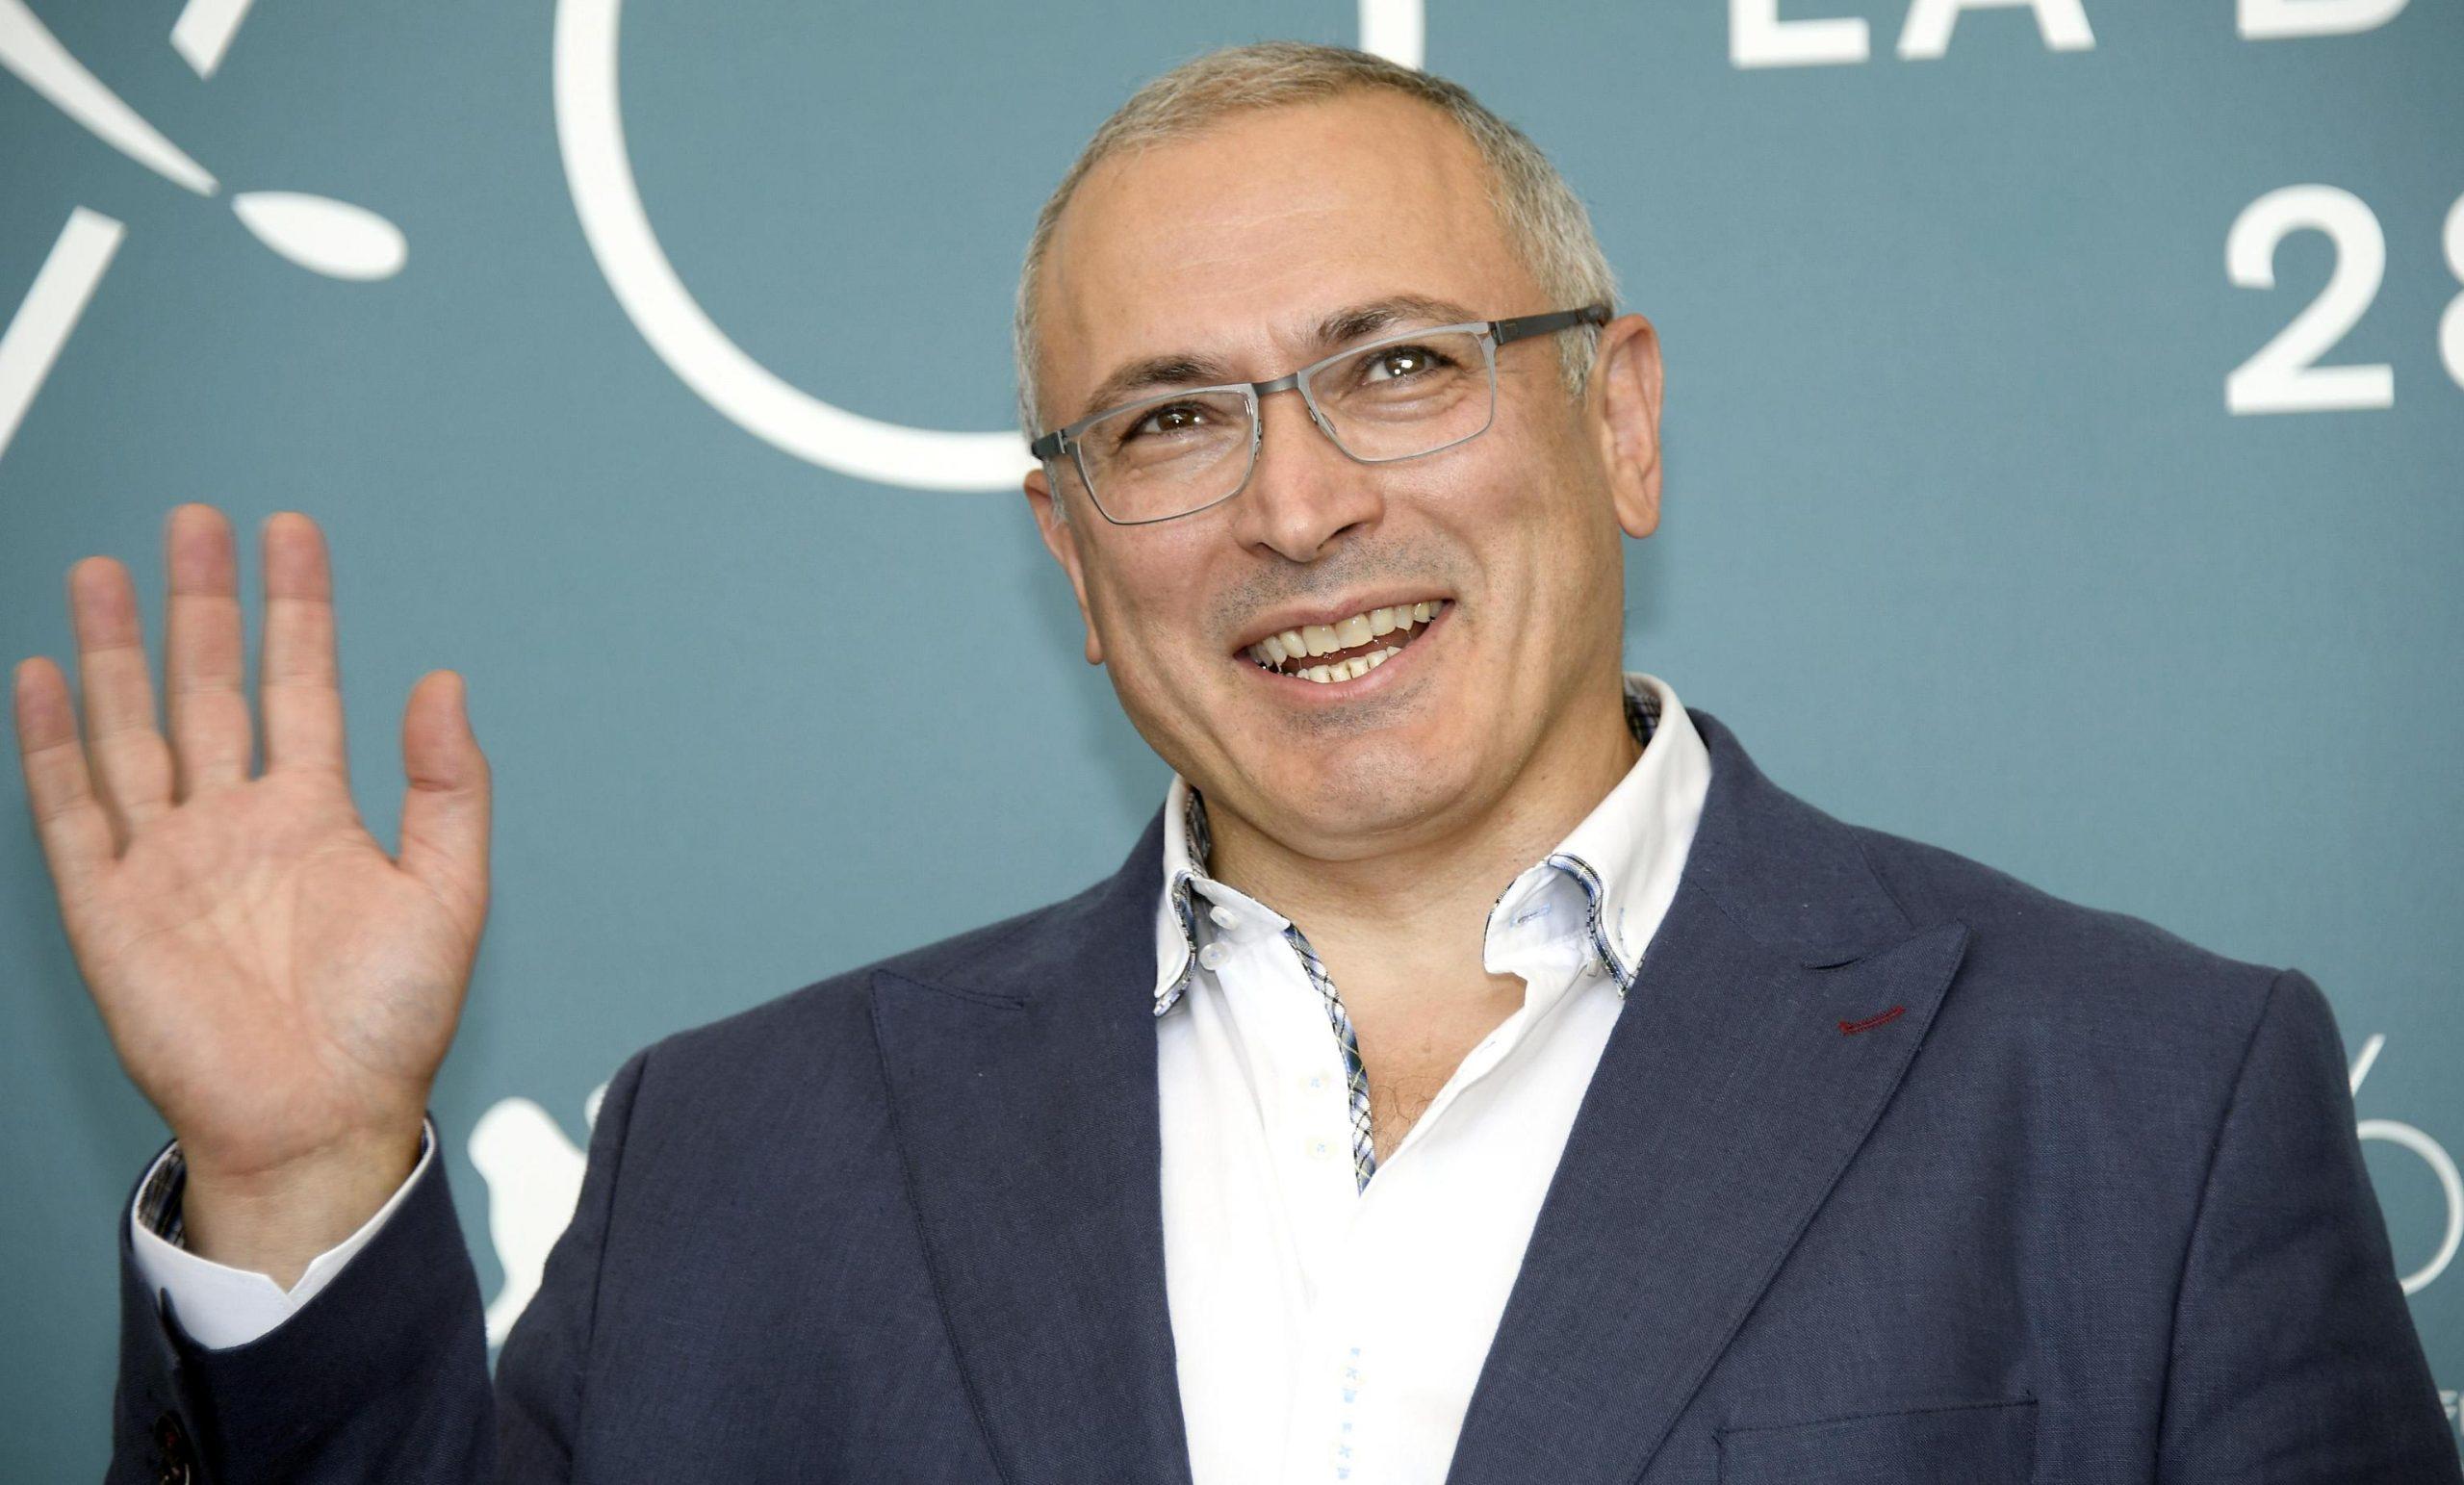 Mihail Hodorkovski Mikhail Khodorkovsky